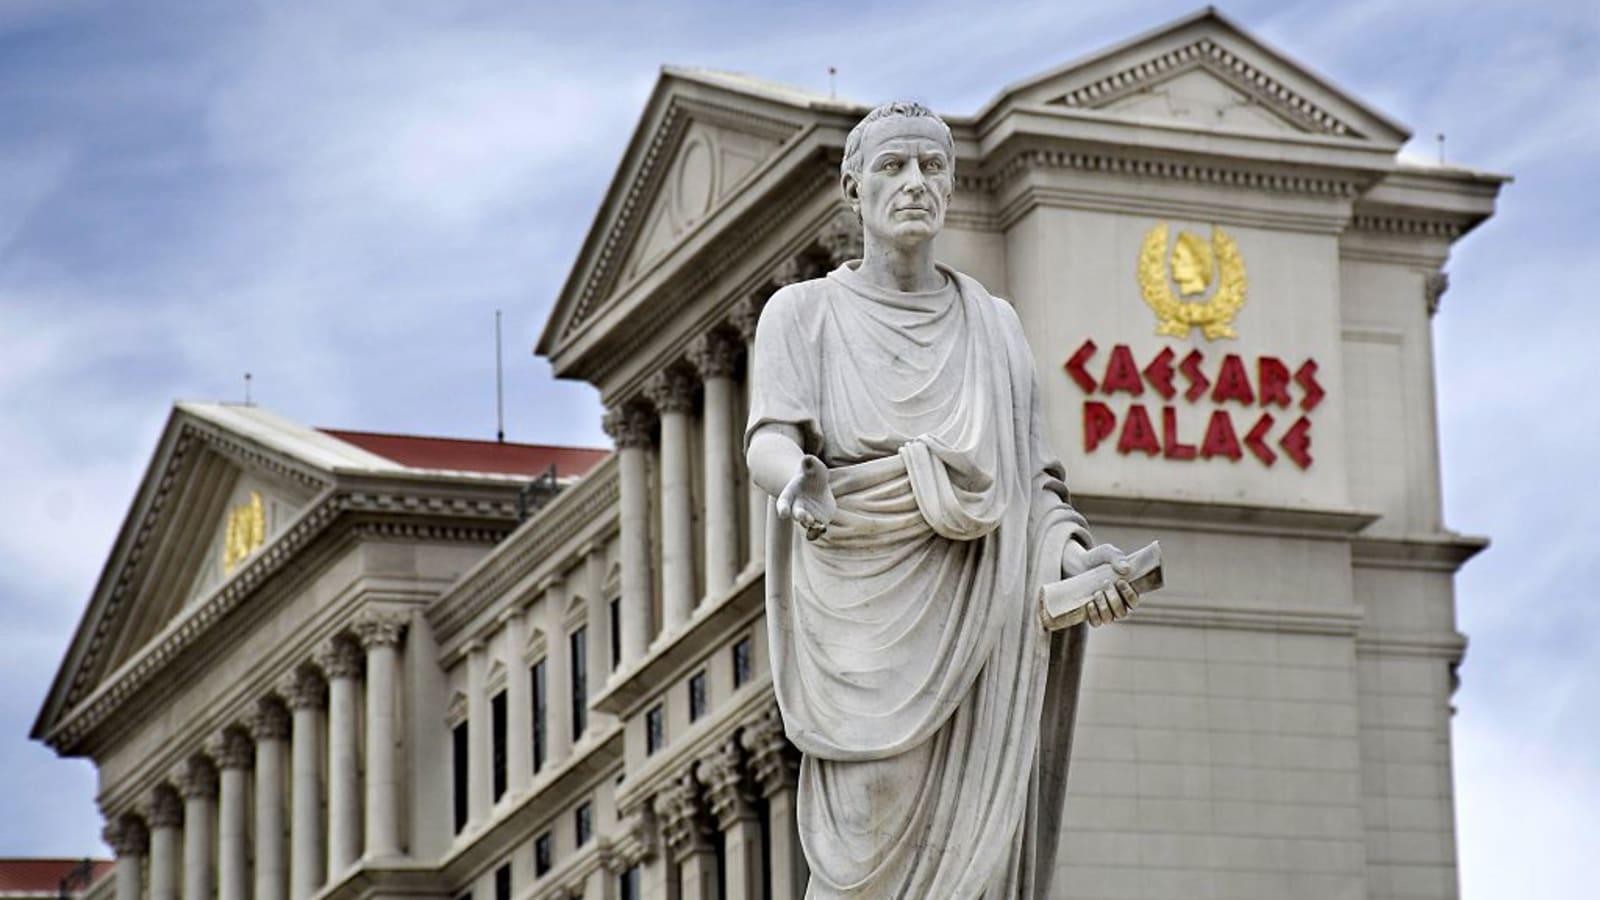 Caesars and Apollo vie for William Hill